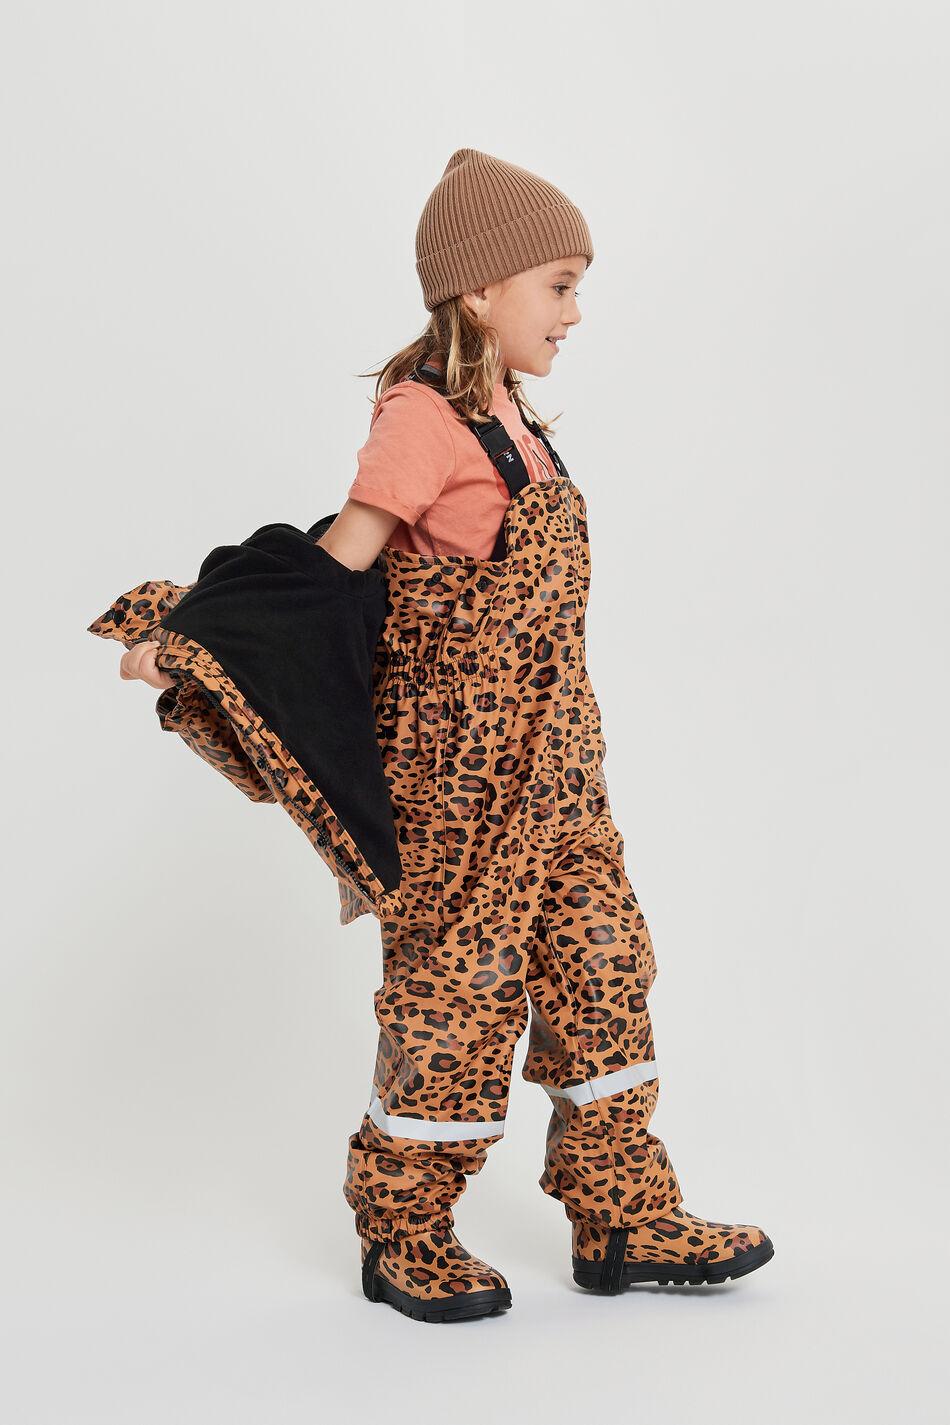 Gina Tricot Tretorn mini rain pants